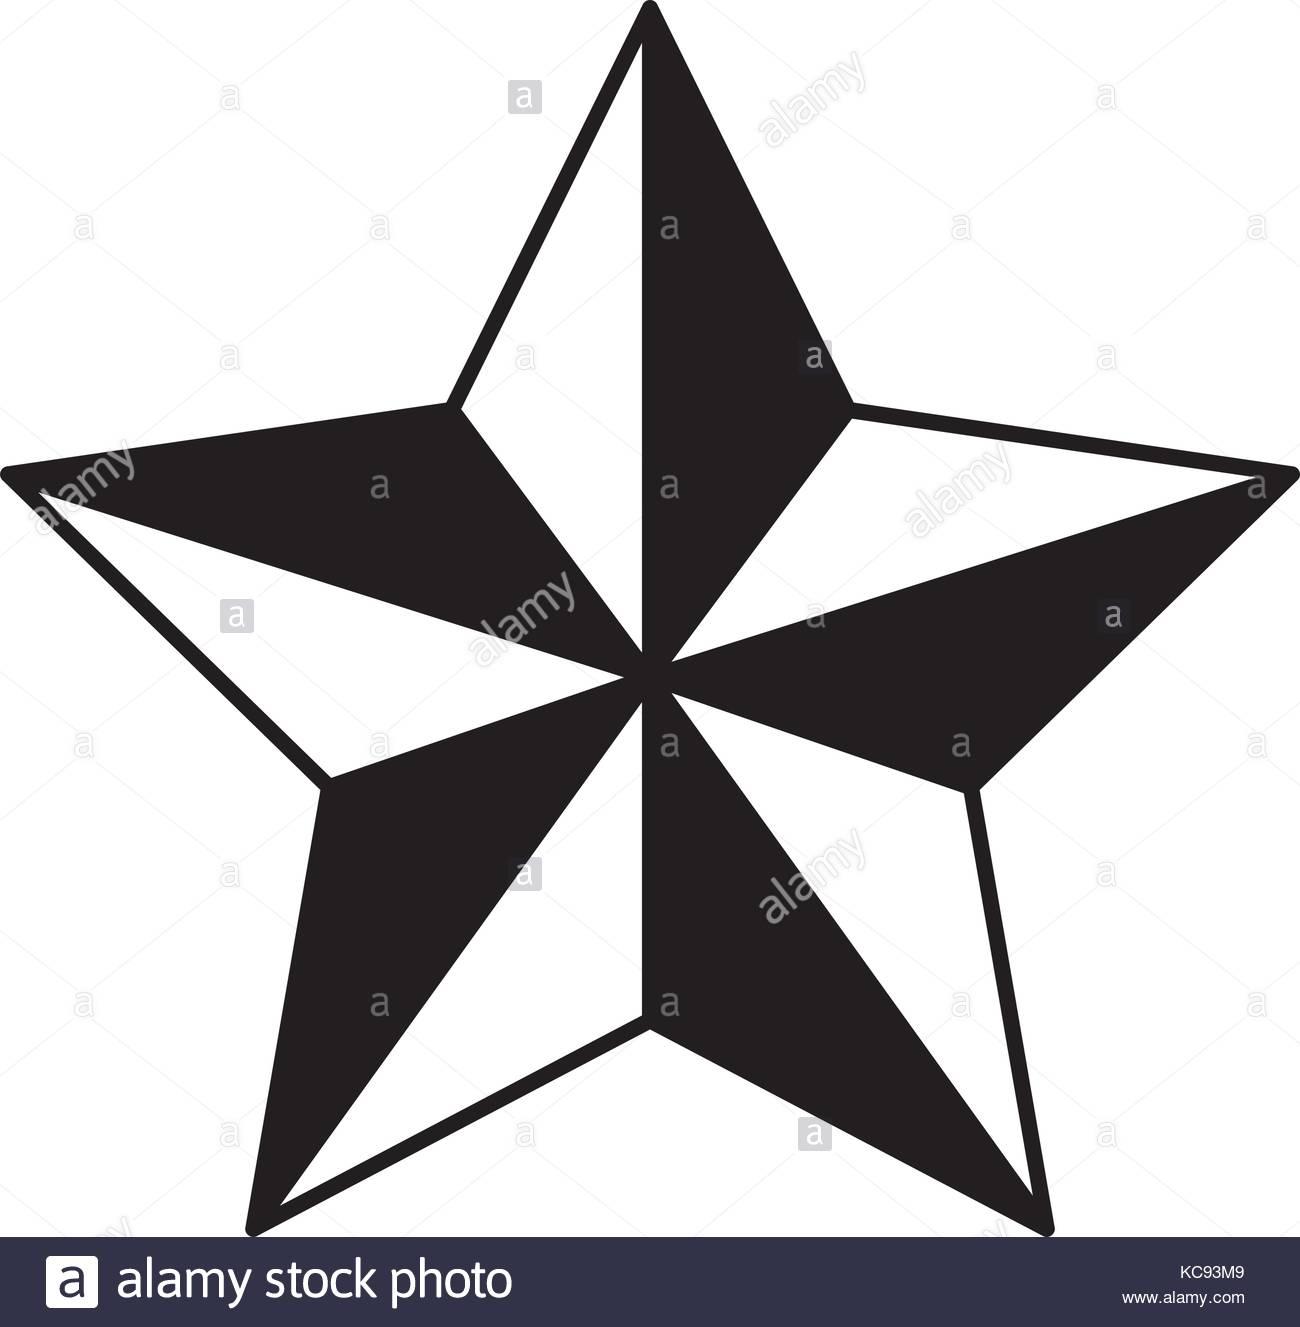 1300x1327 Star Award Flat Icon Black Silhouette Stock Vector Art